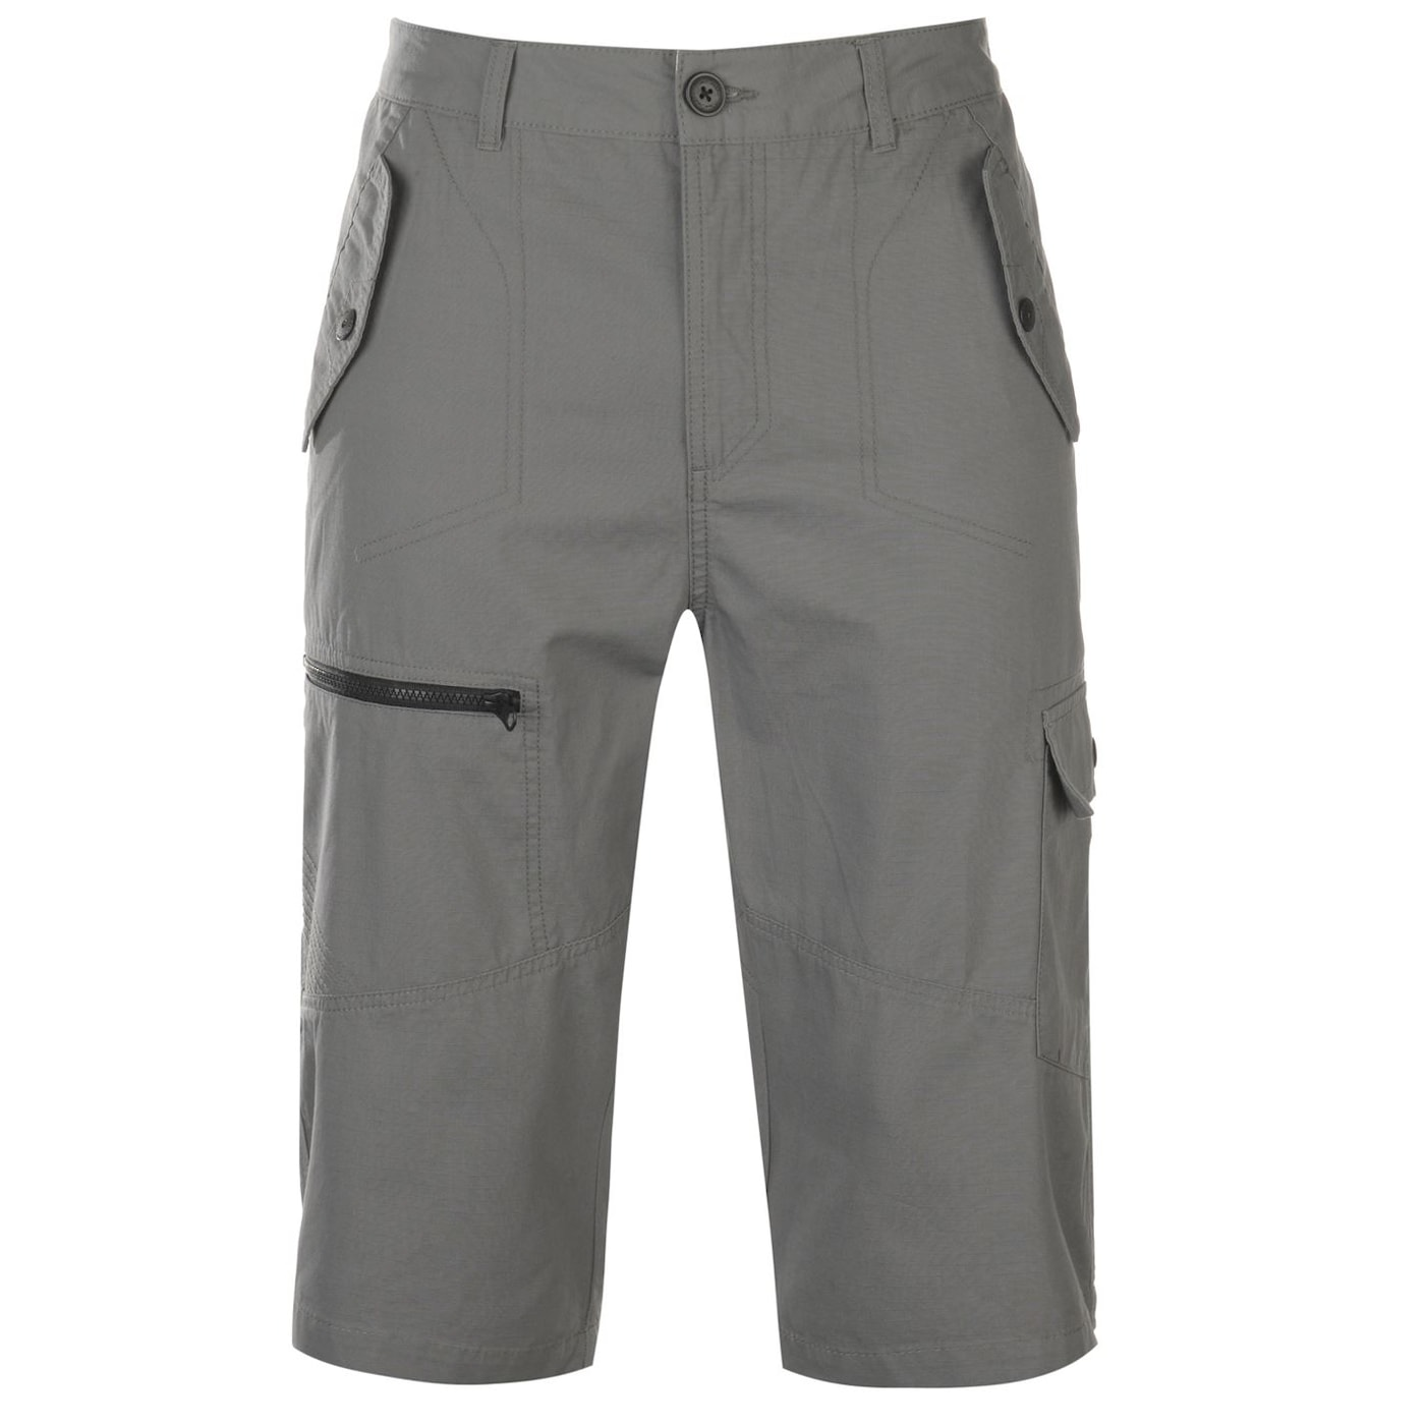 Pierre Cardin Three Quarter Woven Shorts Mens